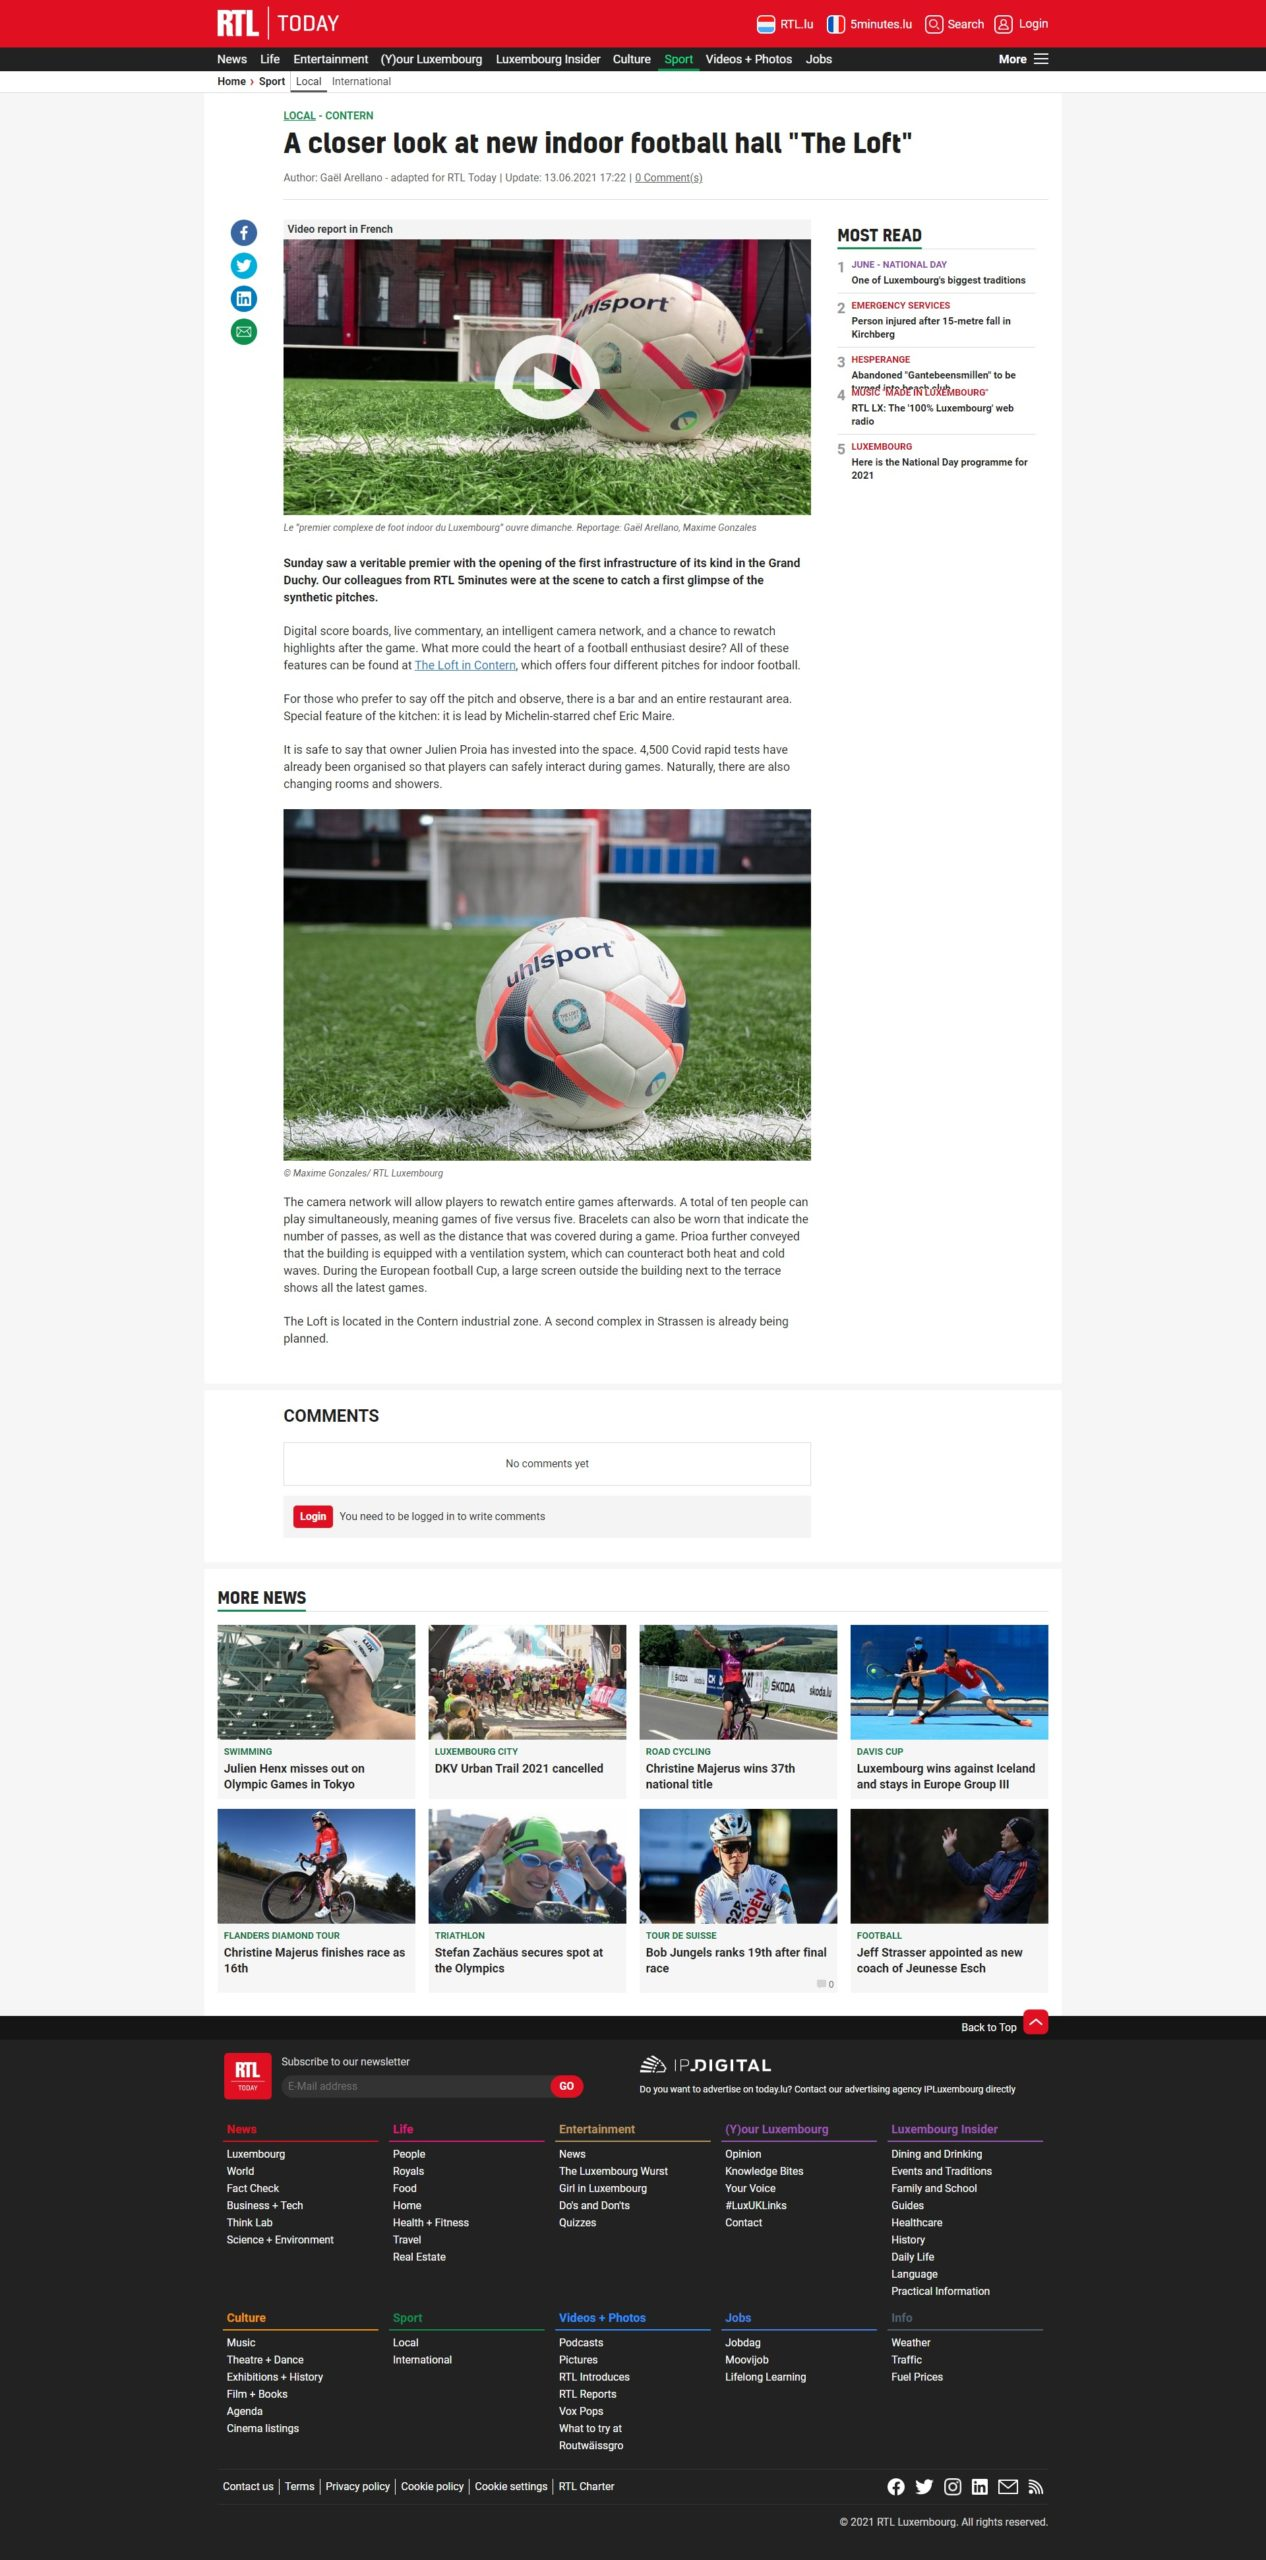 The LOFT : RTL - Today du 6 juin 2021